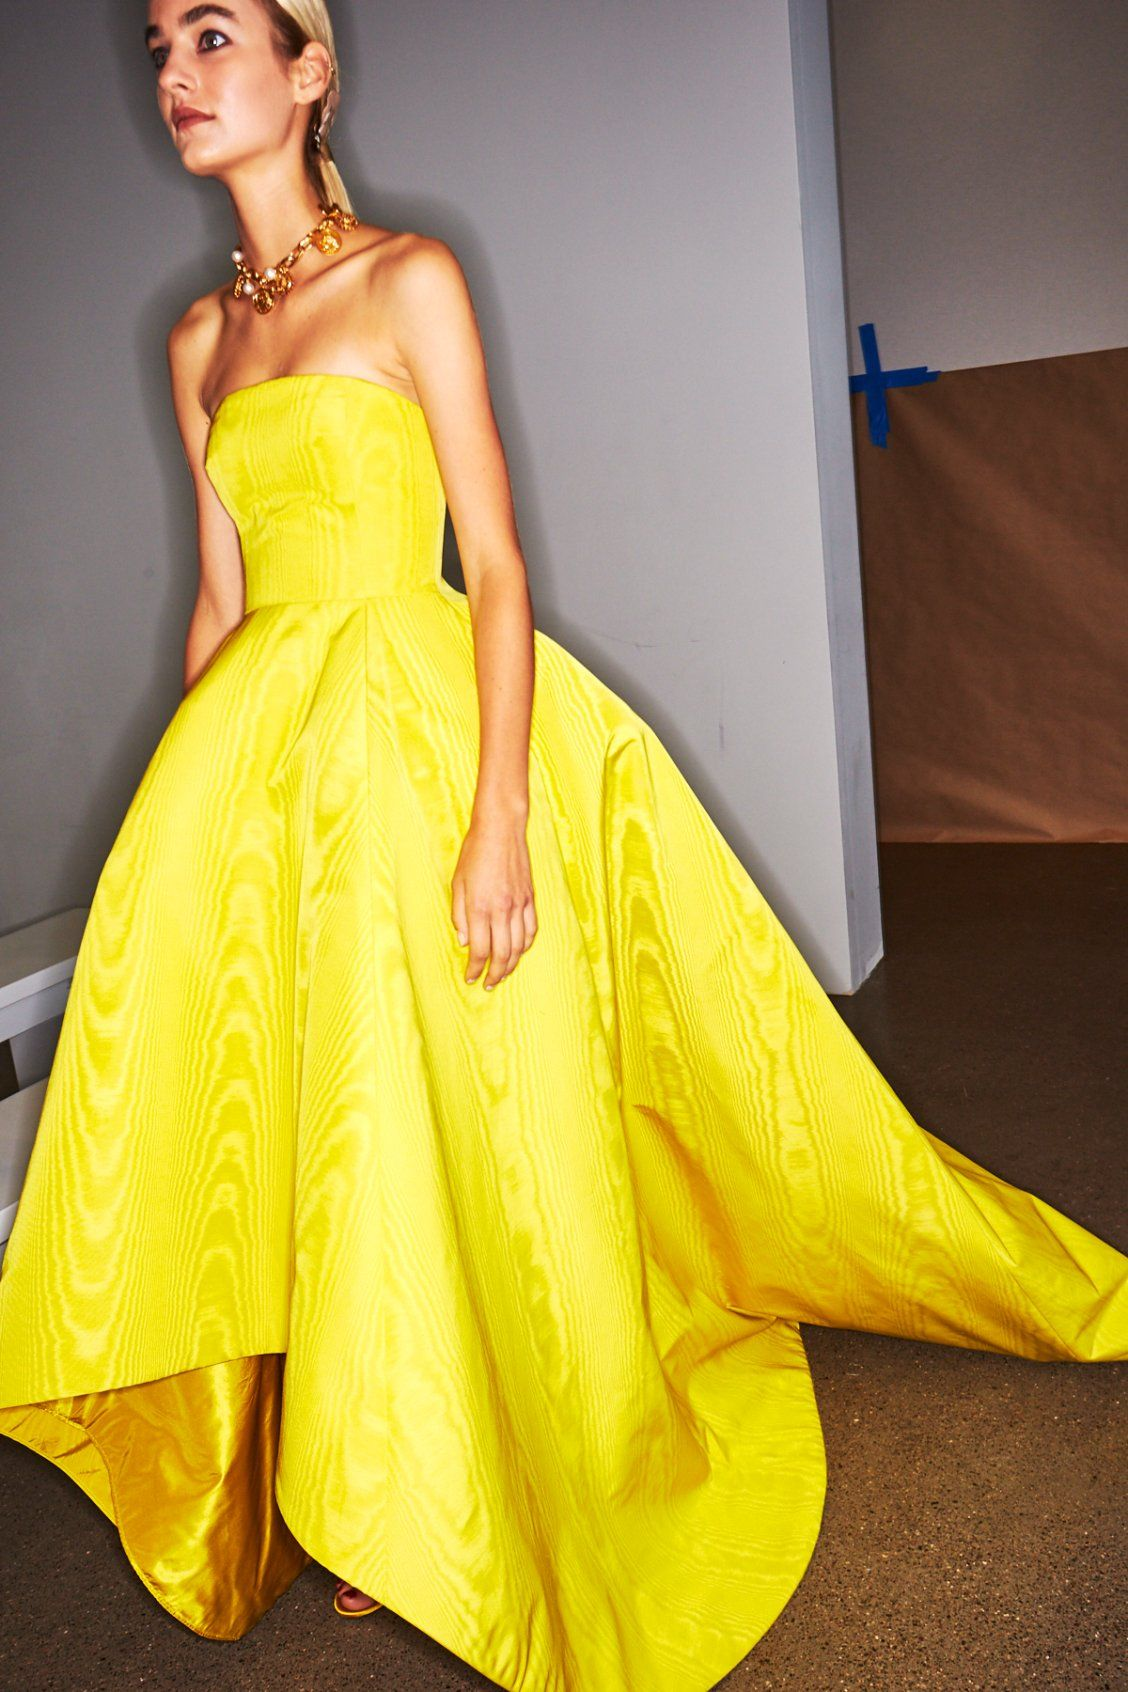 Yellow Strapless High Low Ball Gown By Oscar De La Renta Ss19 Fashion High Low Ball Gown Dresses [ 1692 x 1128 Pixel ]